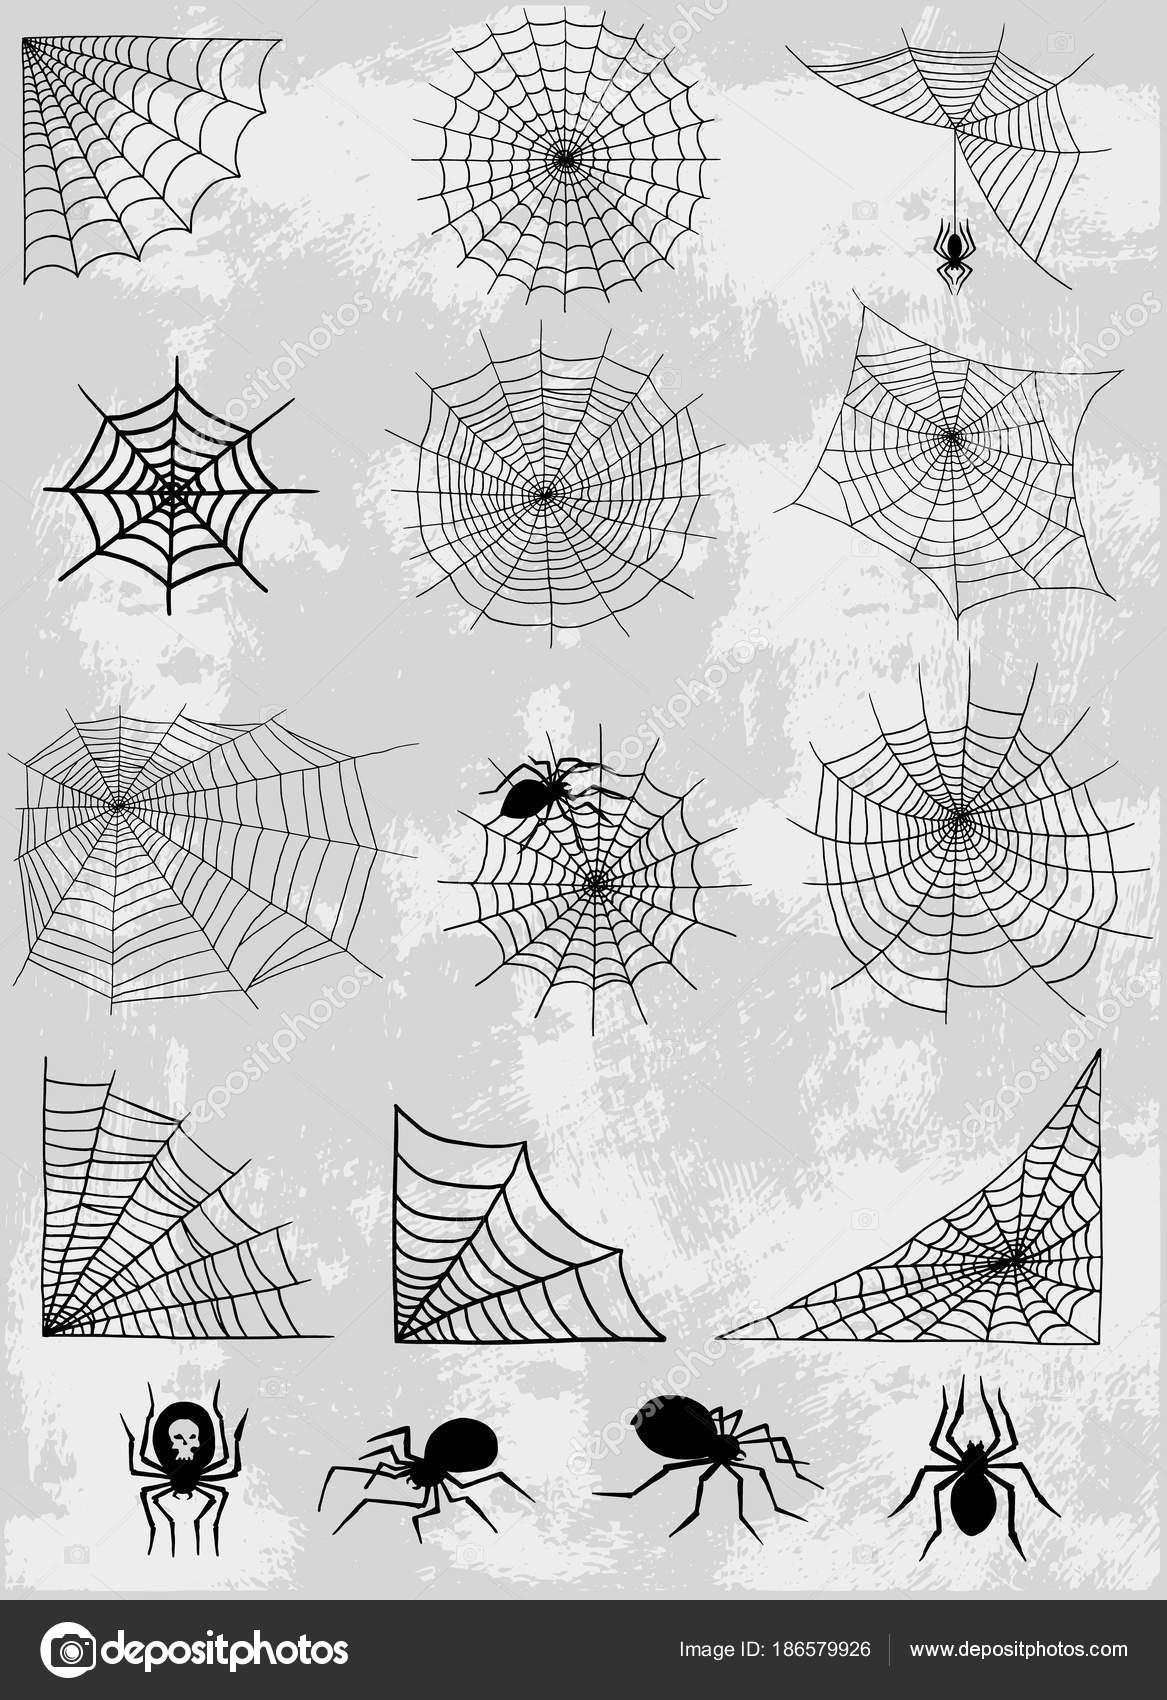 Las arañas web red vector silueta misteriosa naturaleza halloween ...